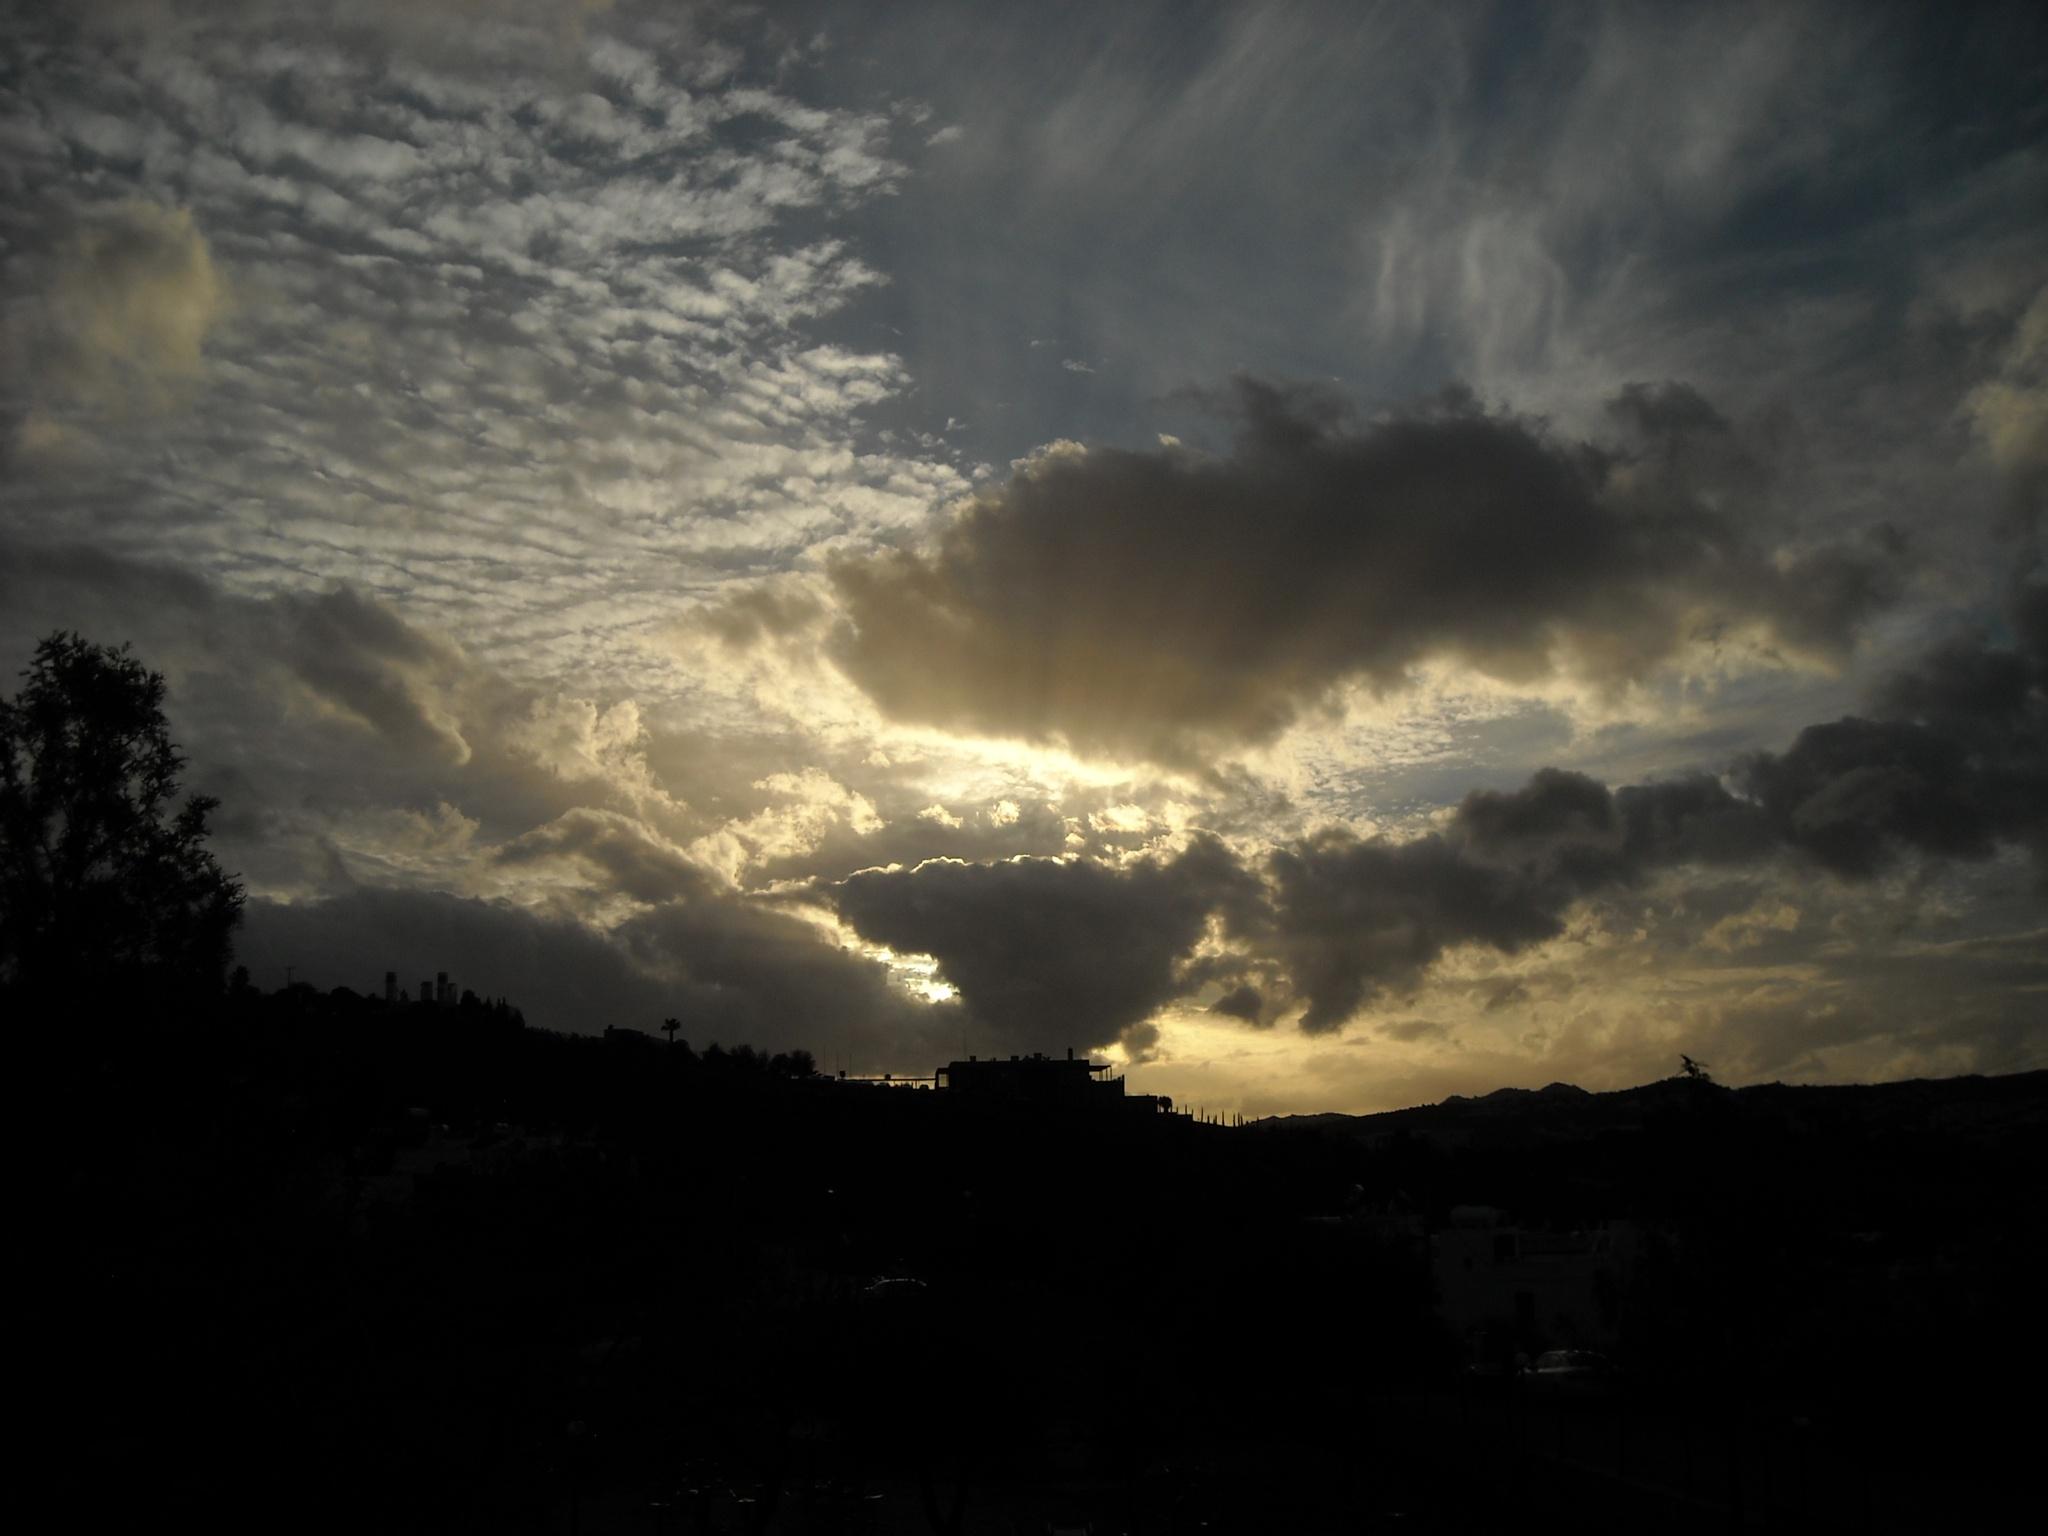 SUNSET FMB, 25/450 by Akin Saner